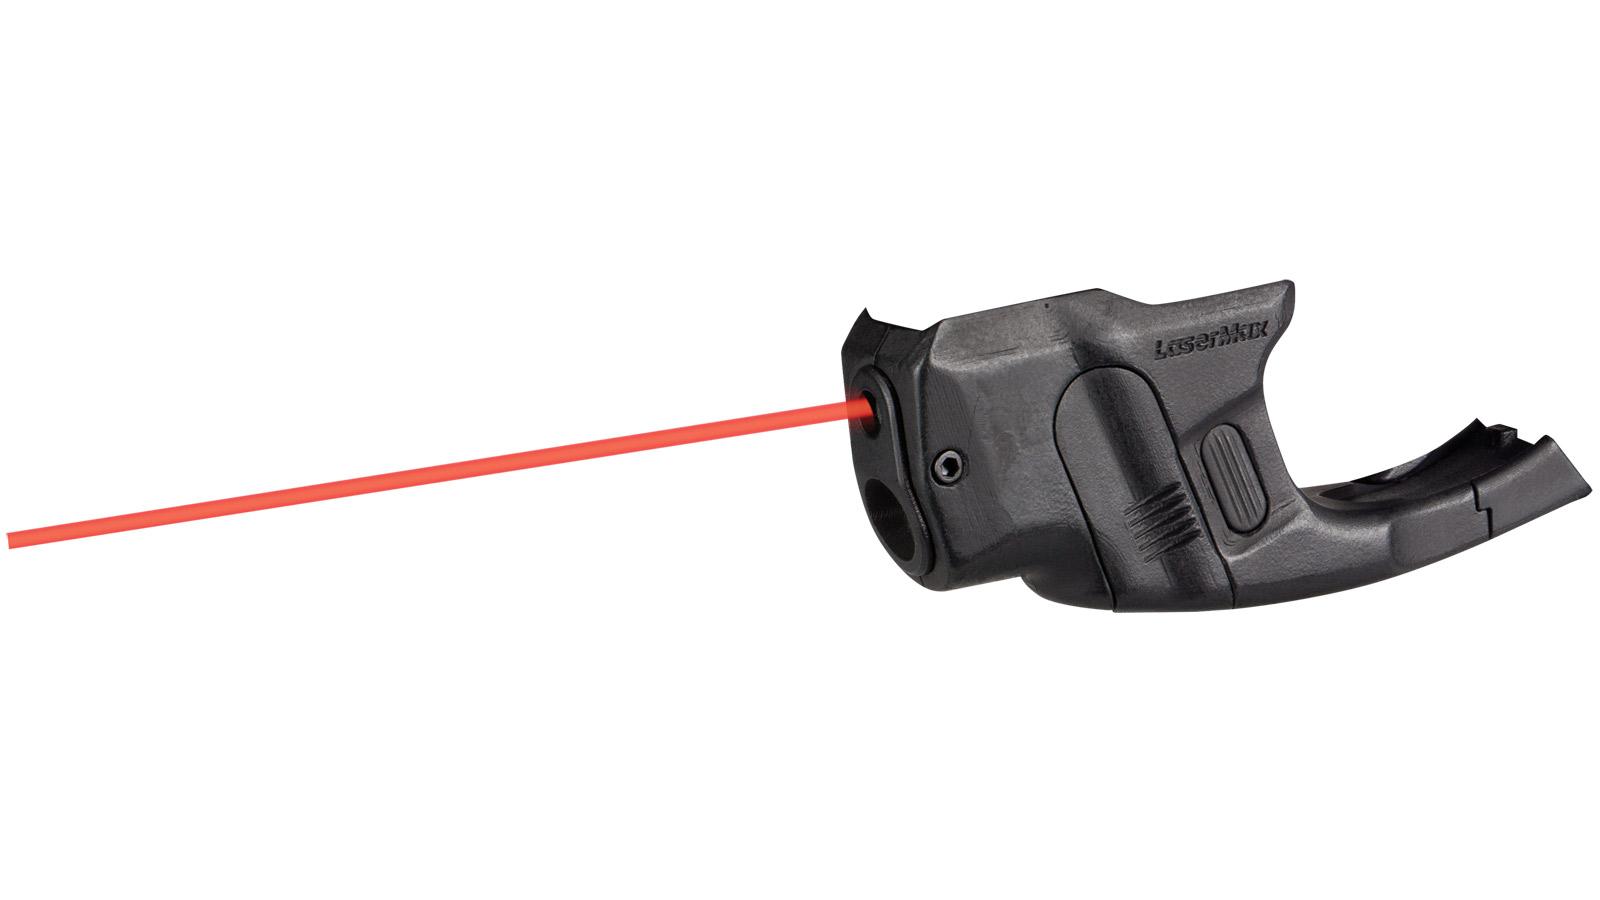 LaserMax CFG4243CR Centerfire Laser Light Combo Red Laser Glock 42 43 Under Barrel